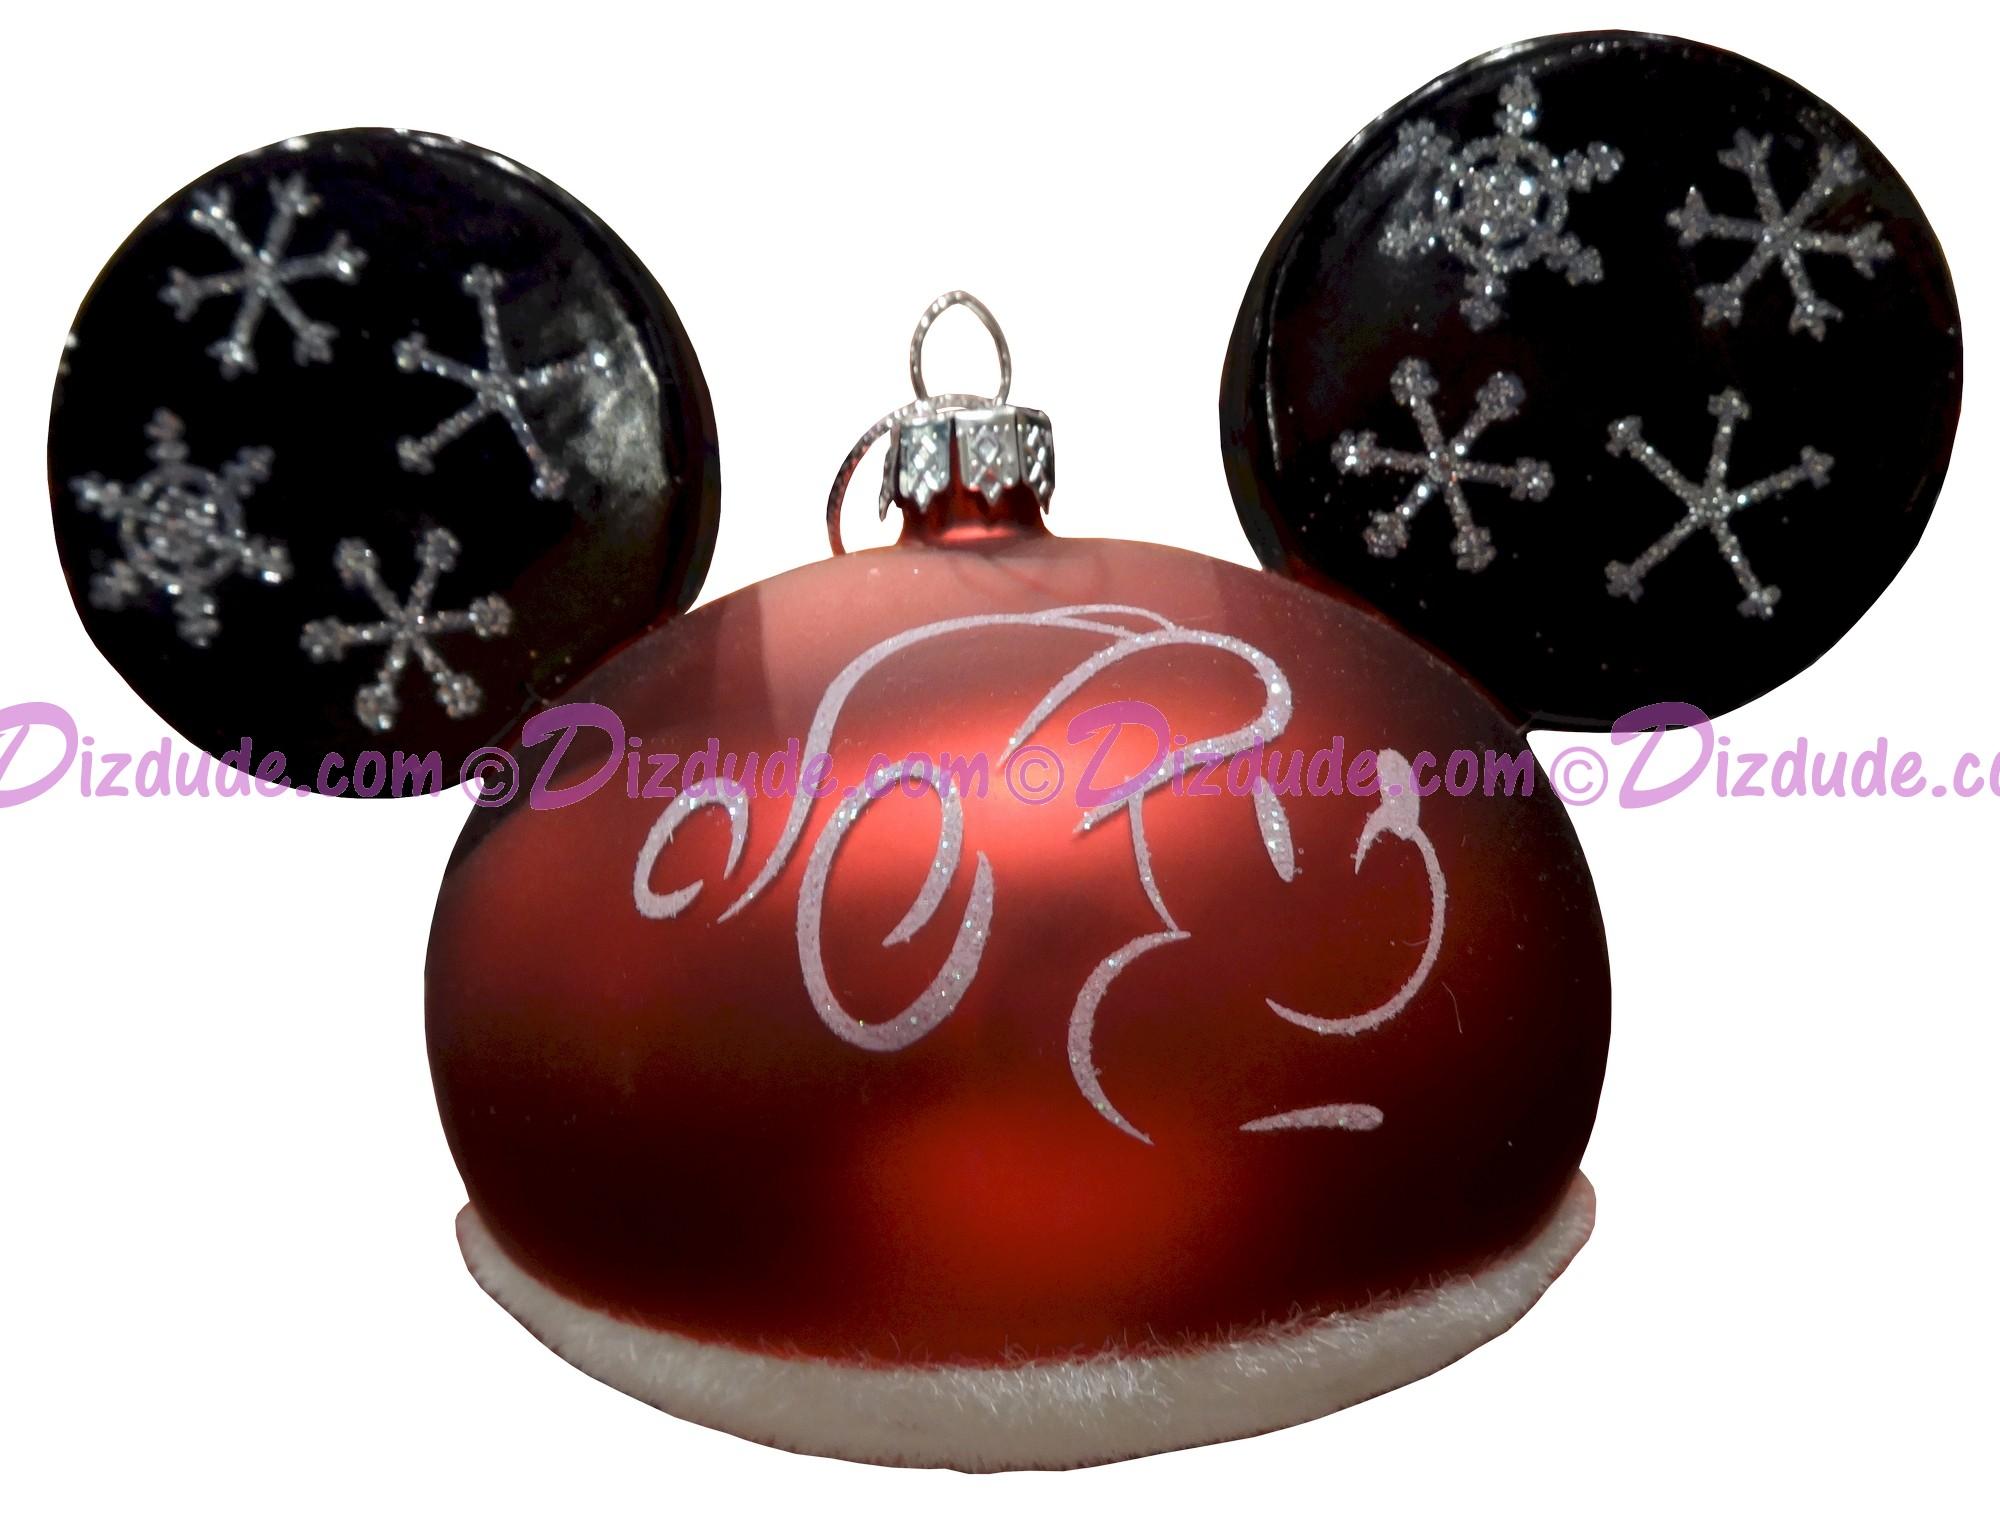 Disney Silhouette Santa Mickey Mouse Ears Christmas Ornament © Dizdude.com